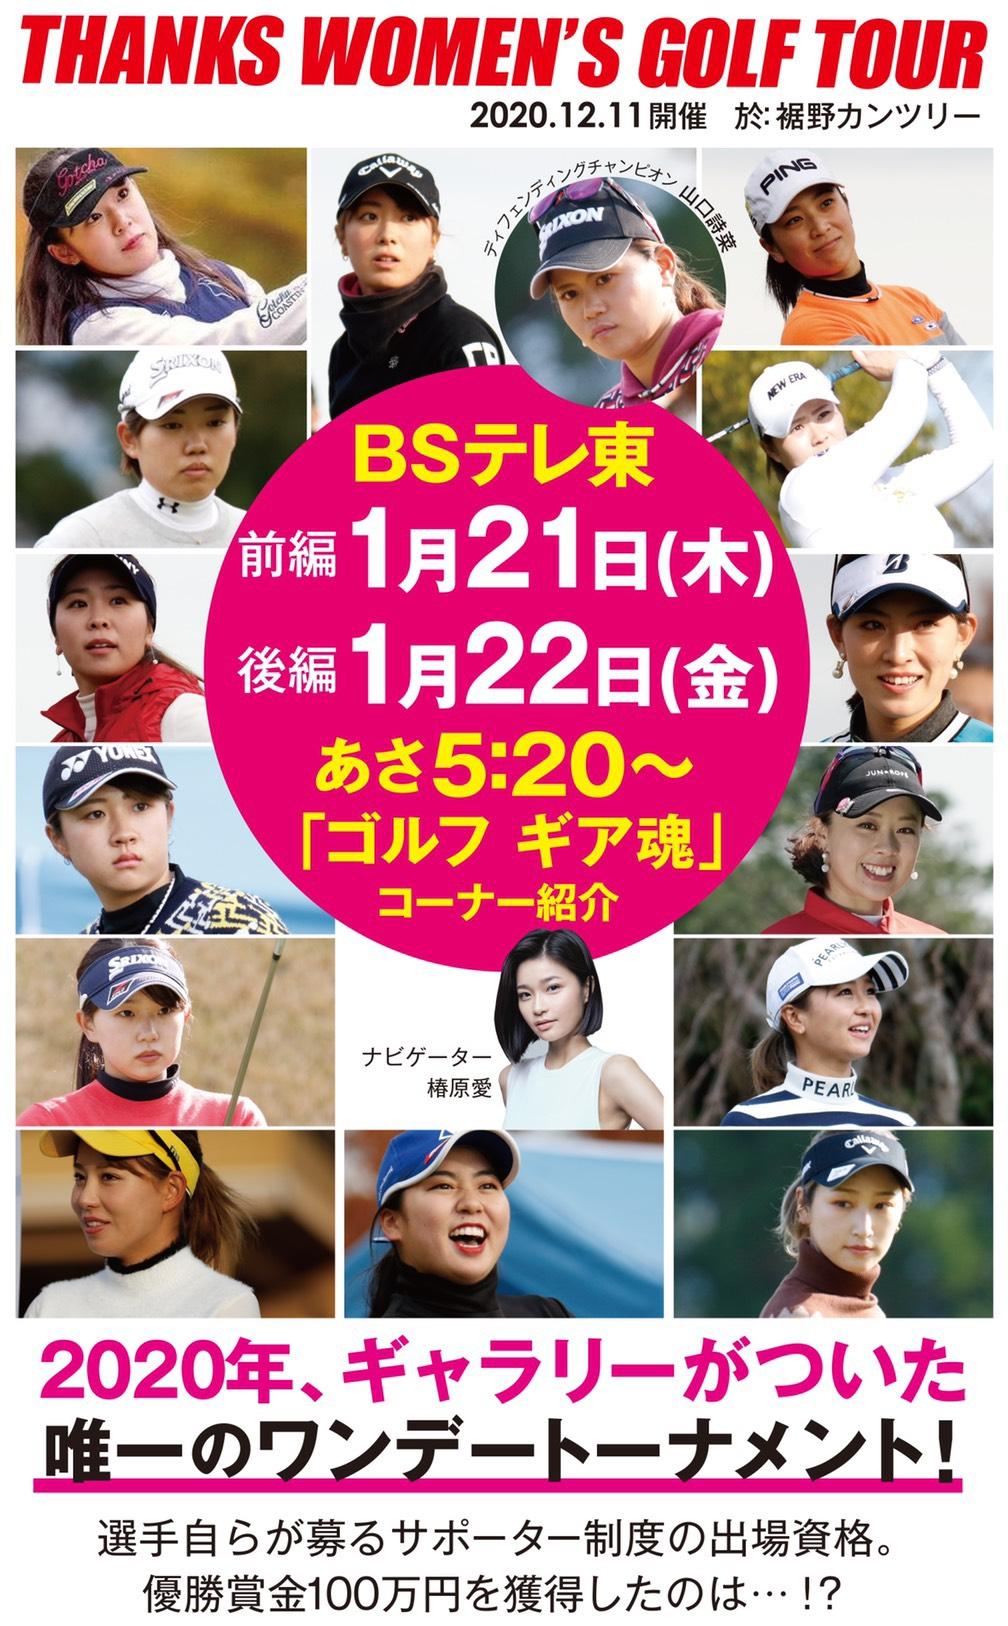 ThanksWomensGolfTour (2020 12/11開催)がBSテレ東で1/21 22に放送